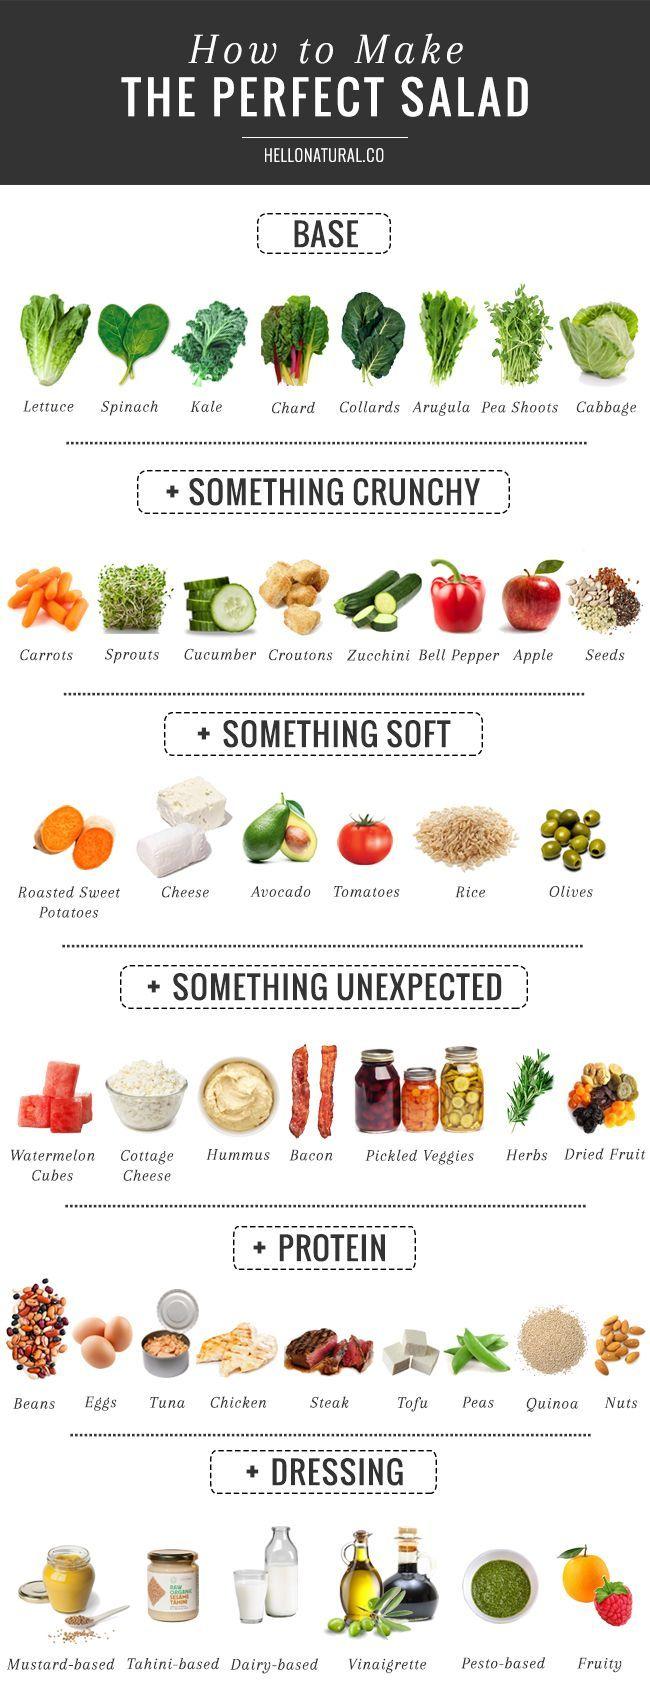 30-Day-Salad-Challenge-Asia-Milia-Curves-N-Cardio-2.jpg